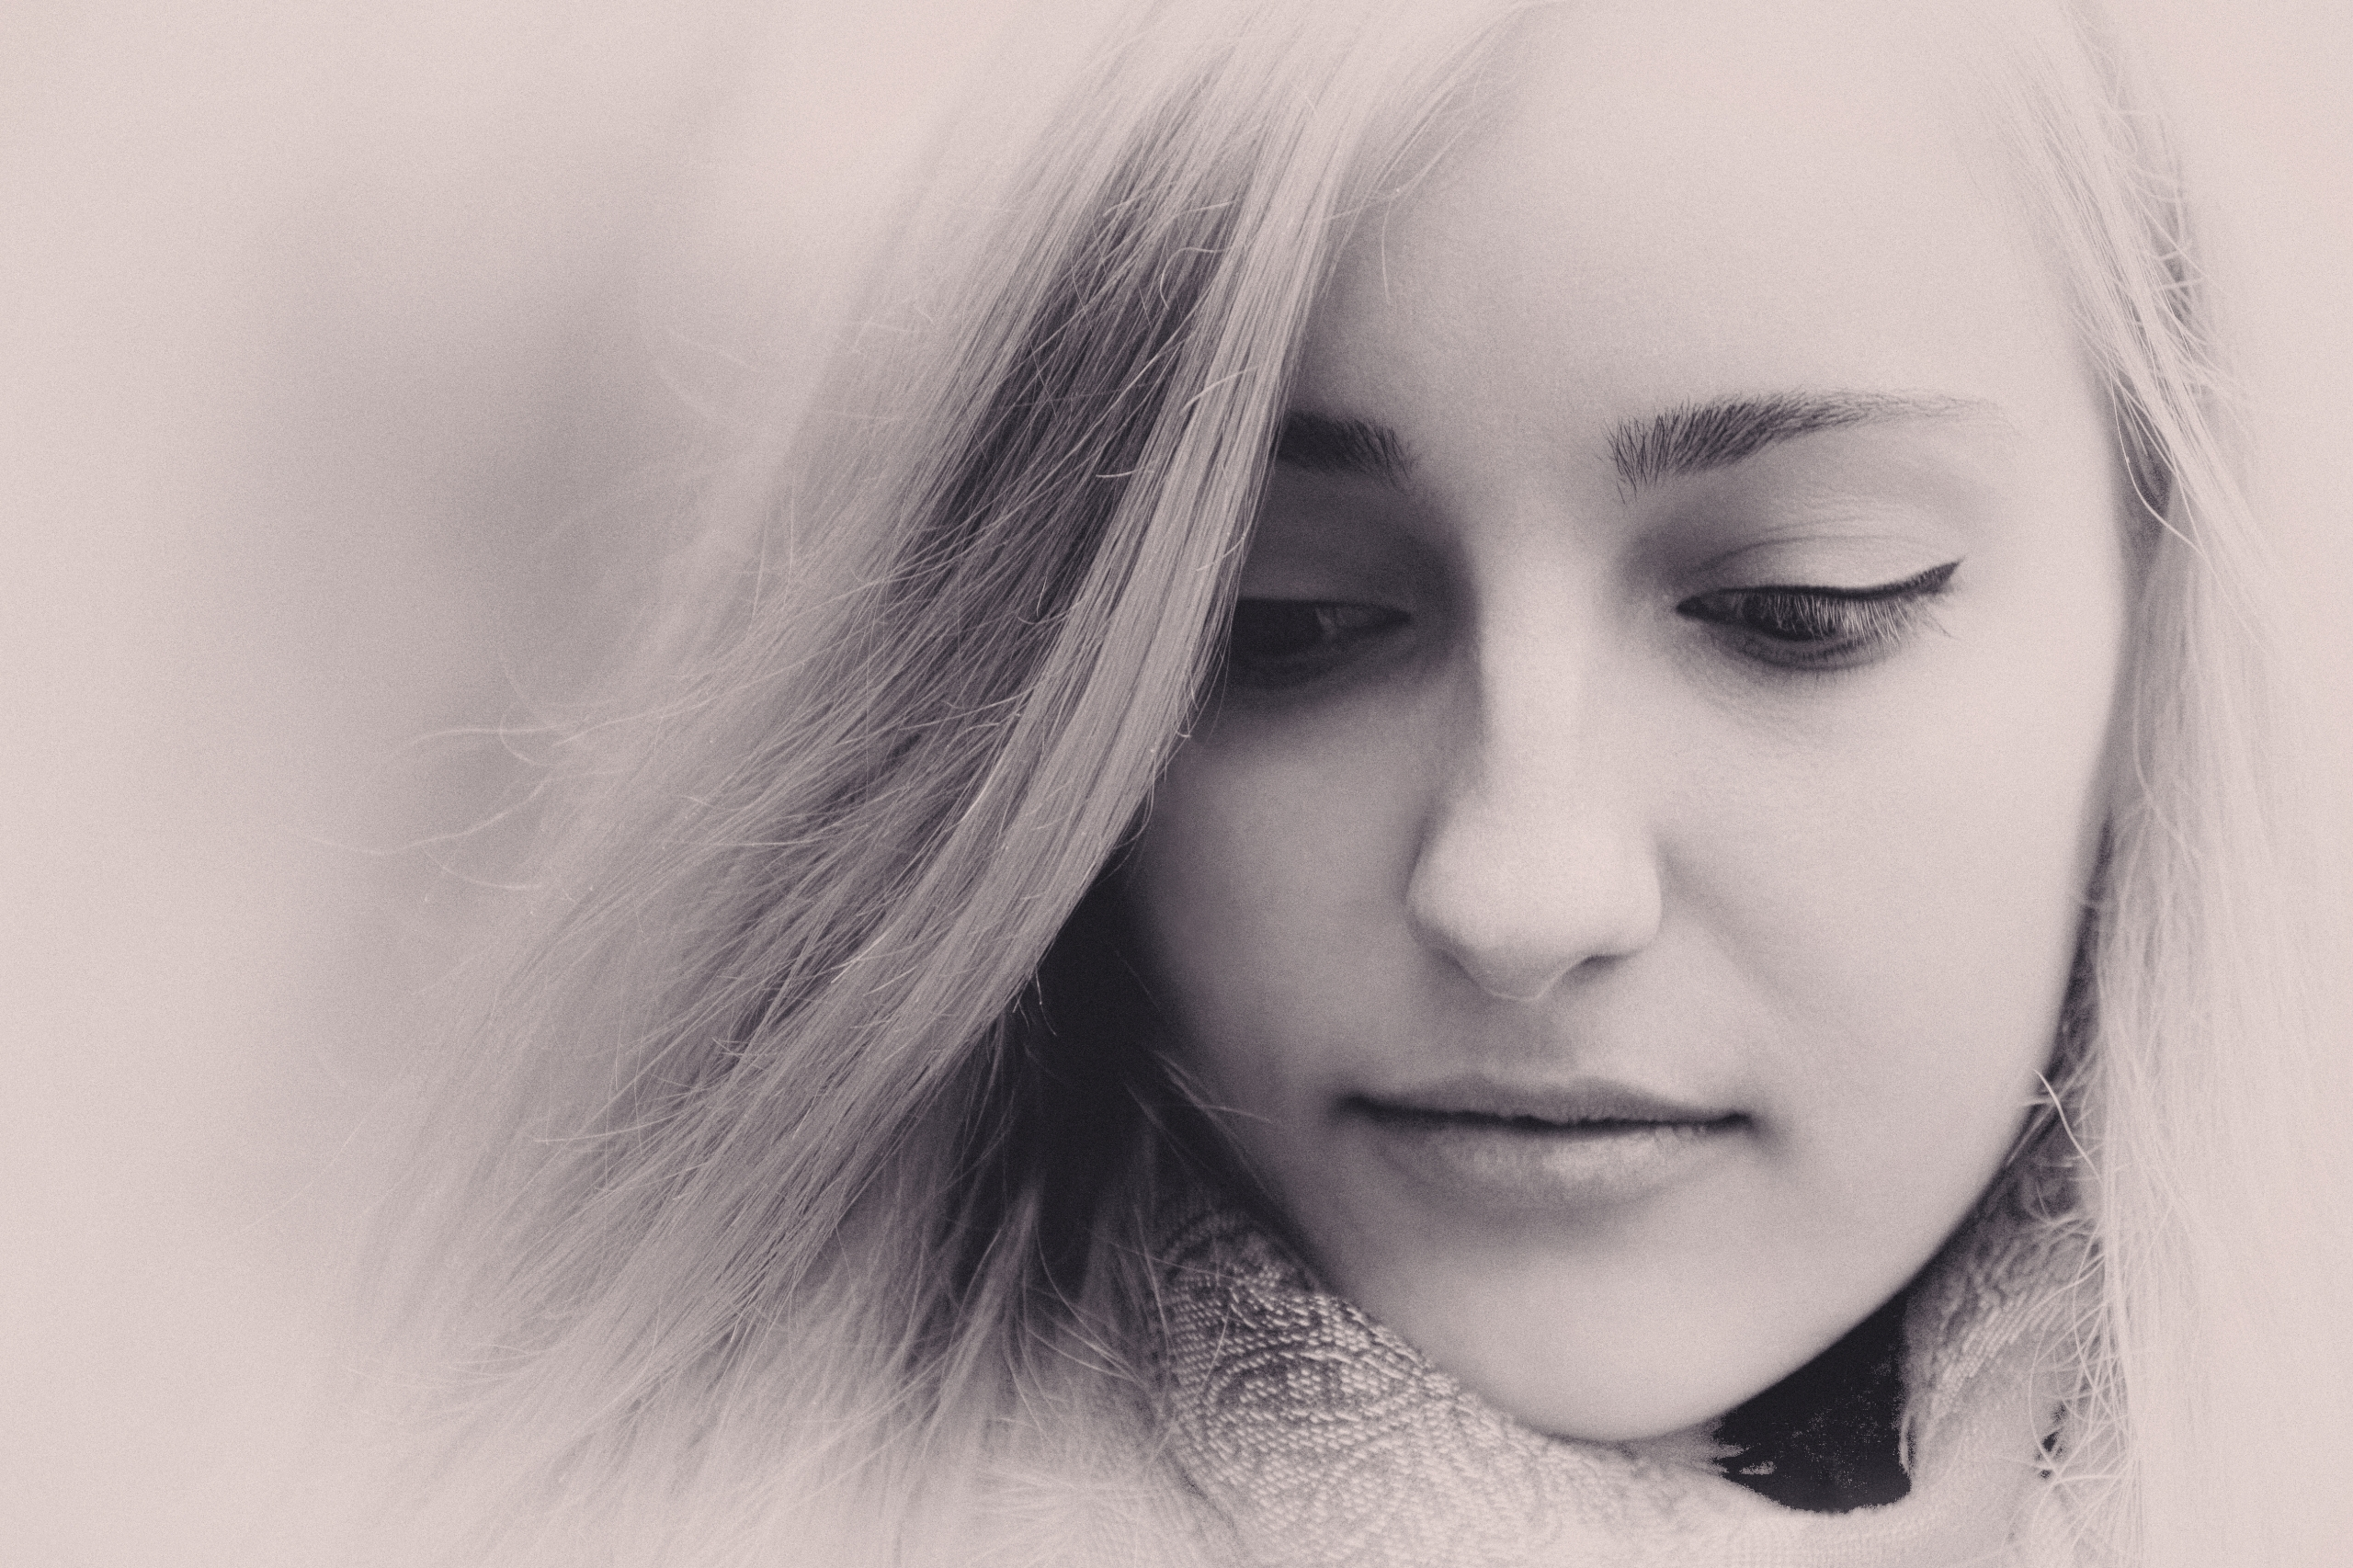 dream - ello, blackandwhite, photography - panioan | ello